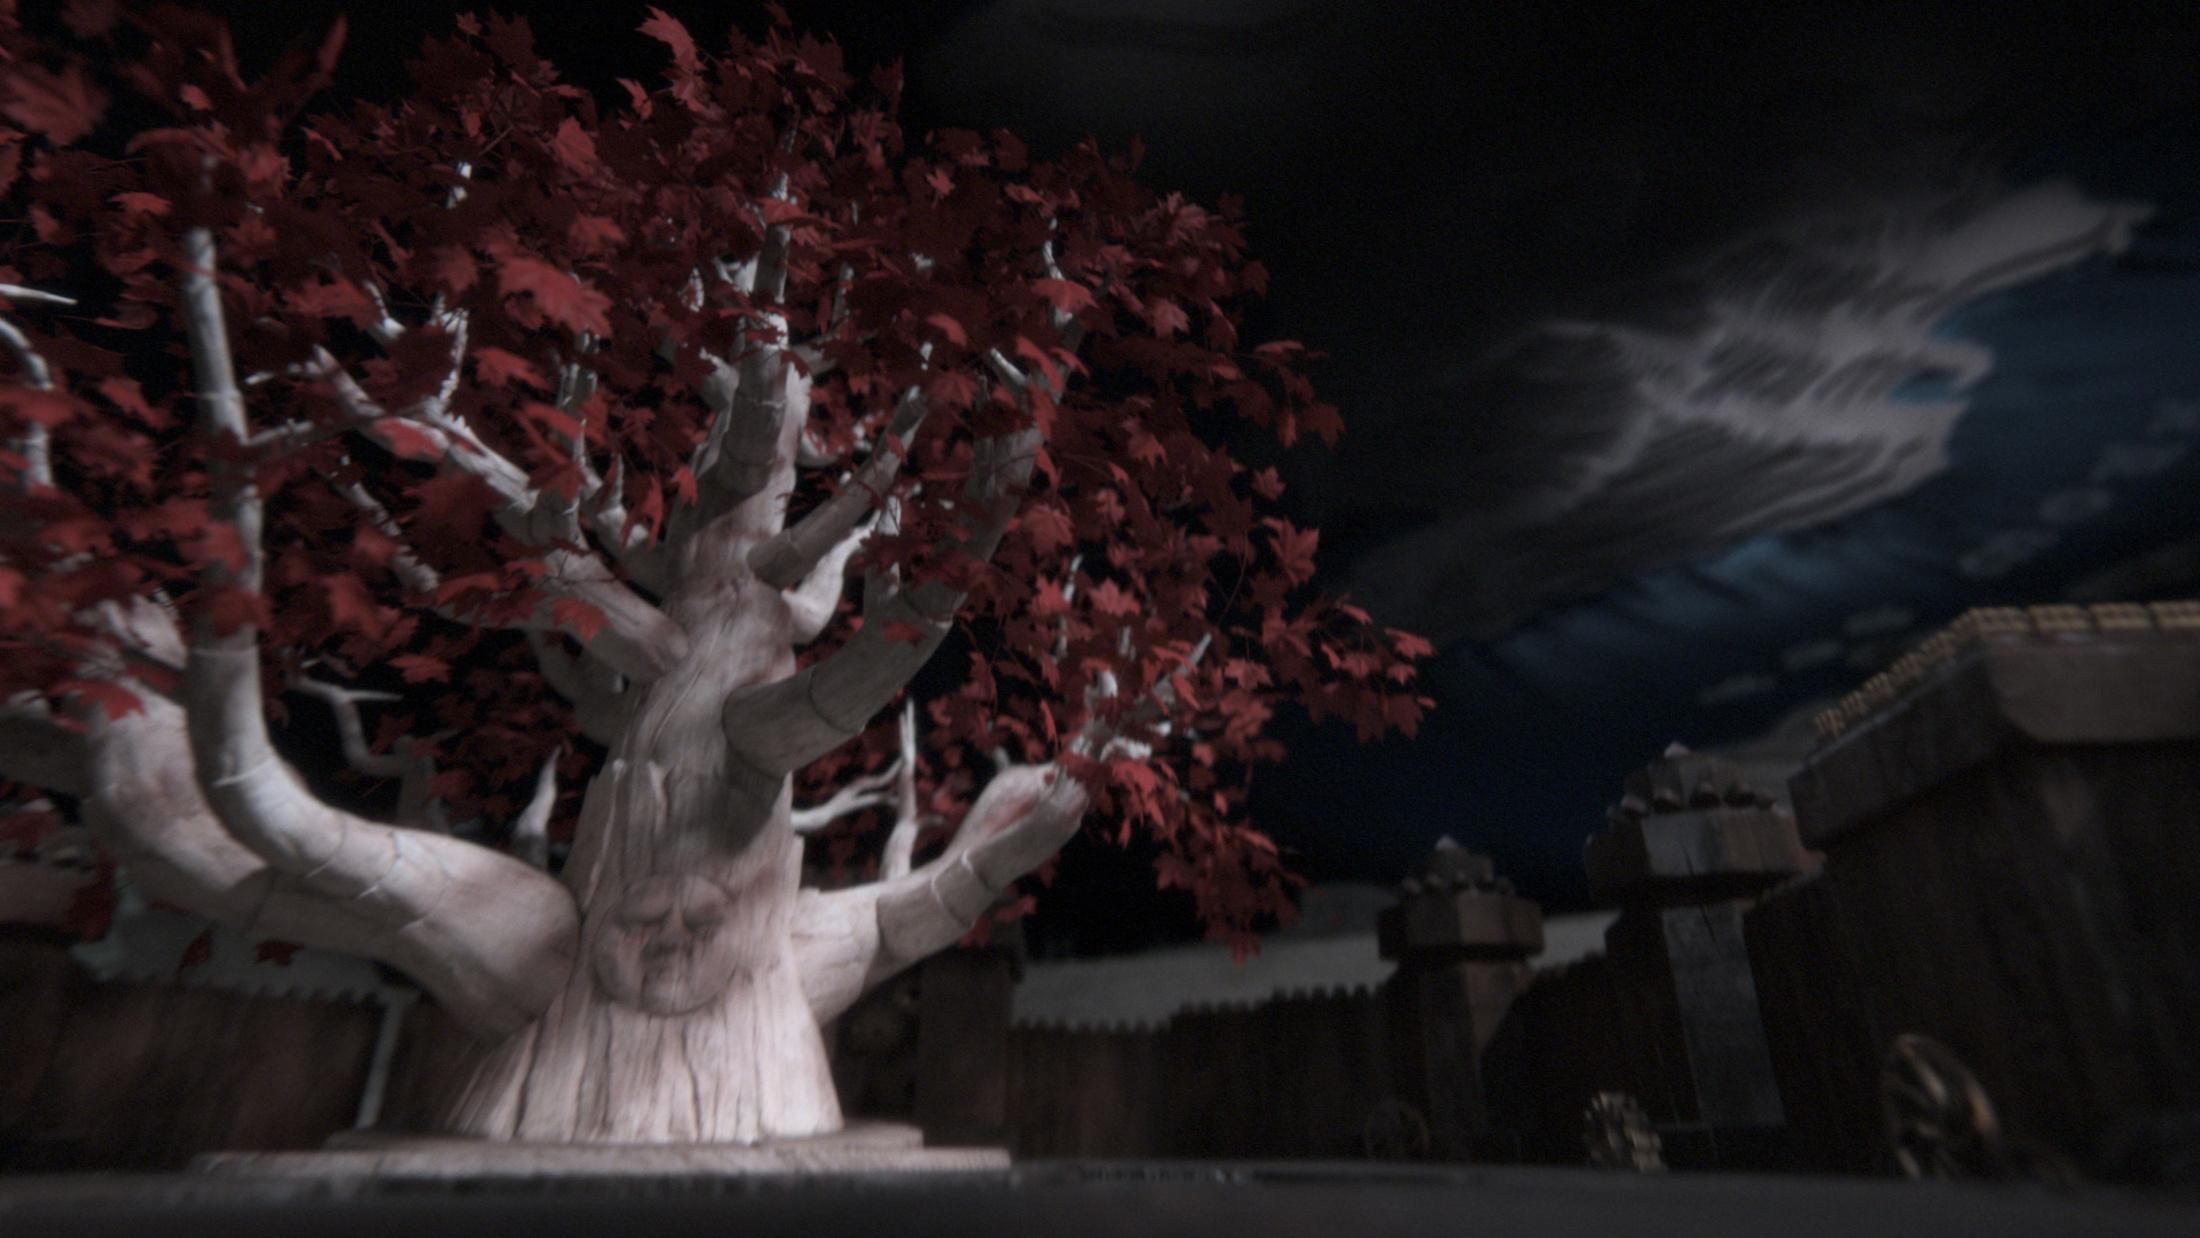 Thumbnail for Game of Thrones Season 8